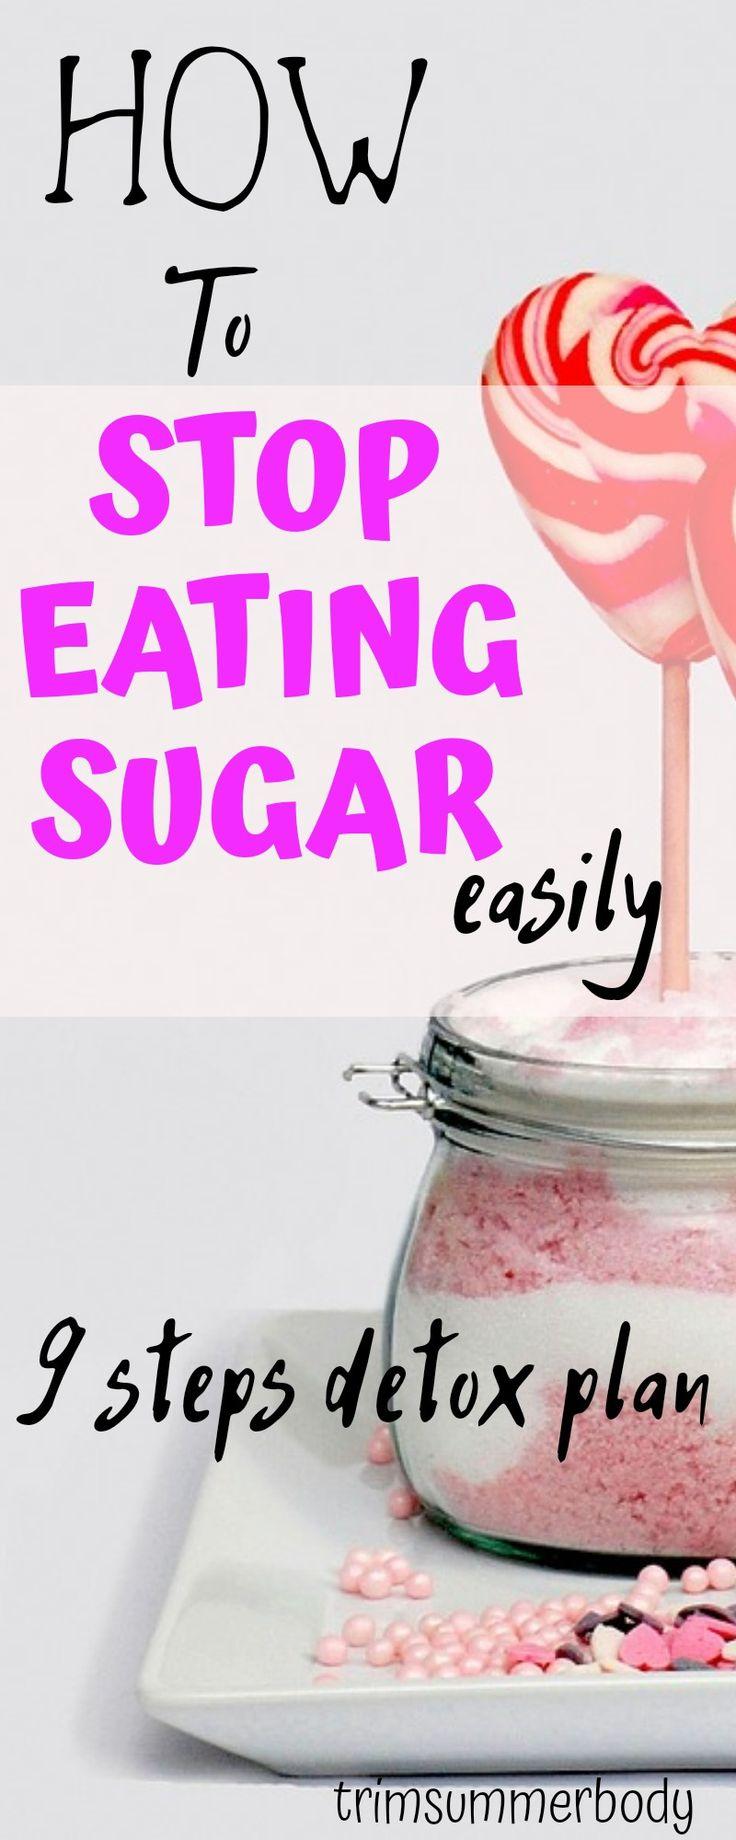 Stop sugar addiction and stop eating sugar with this detox plan